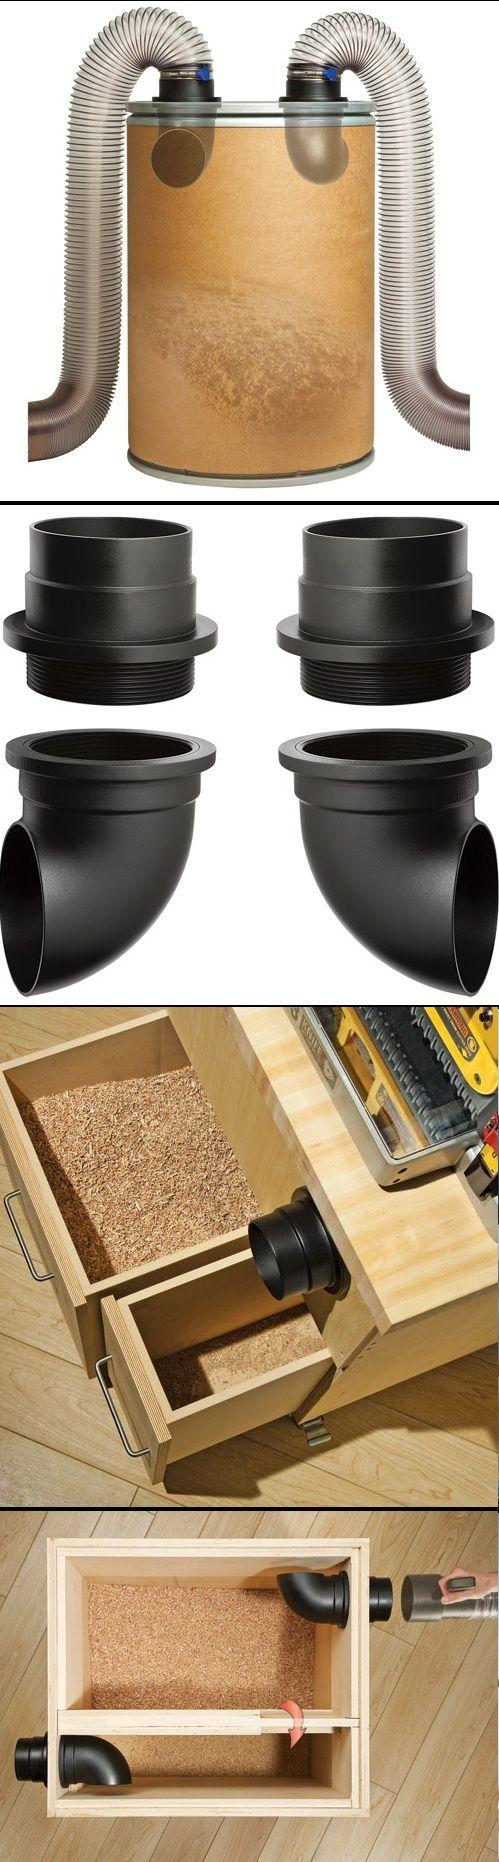 Dust separator box